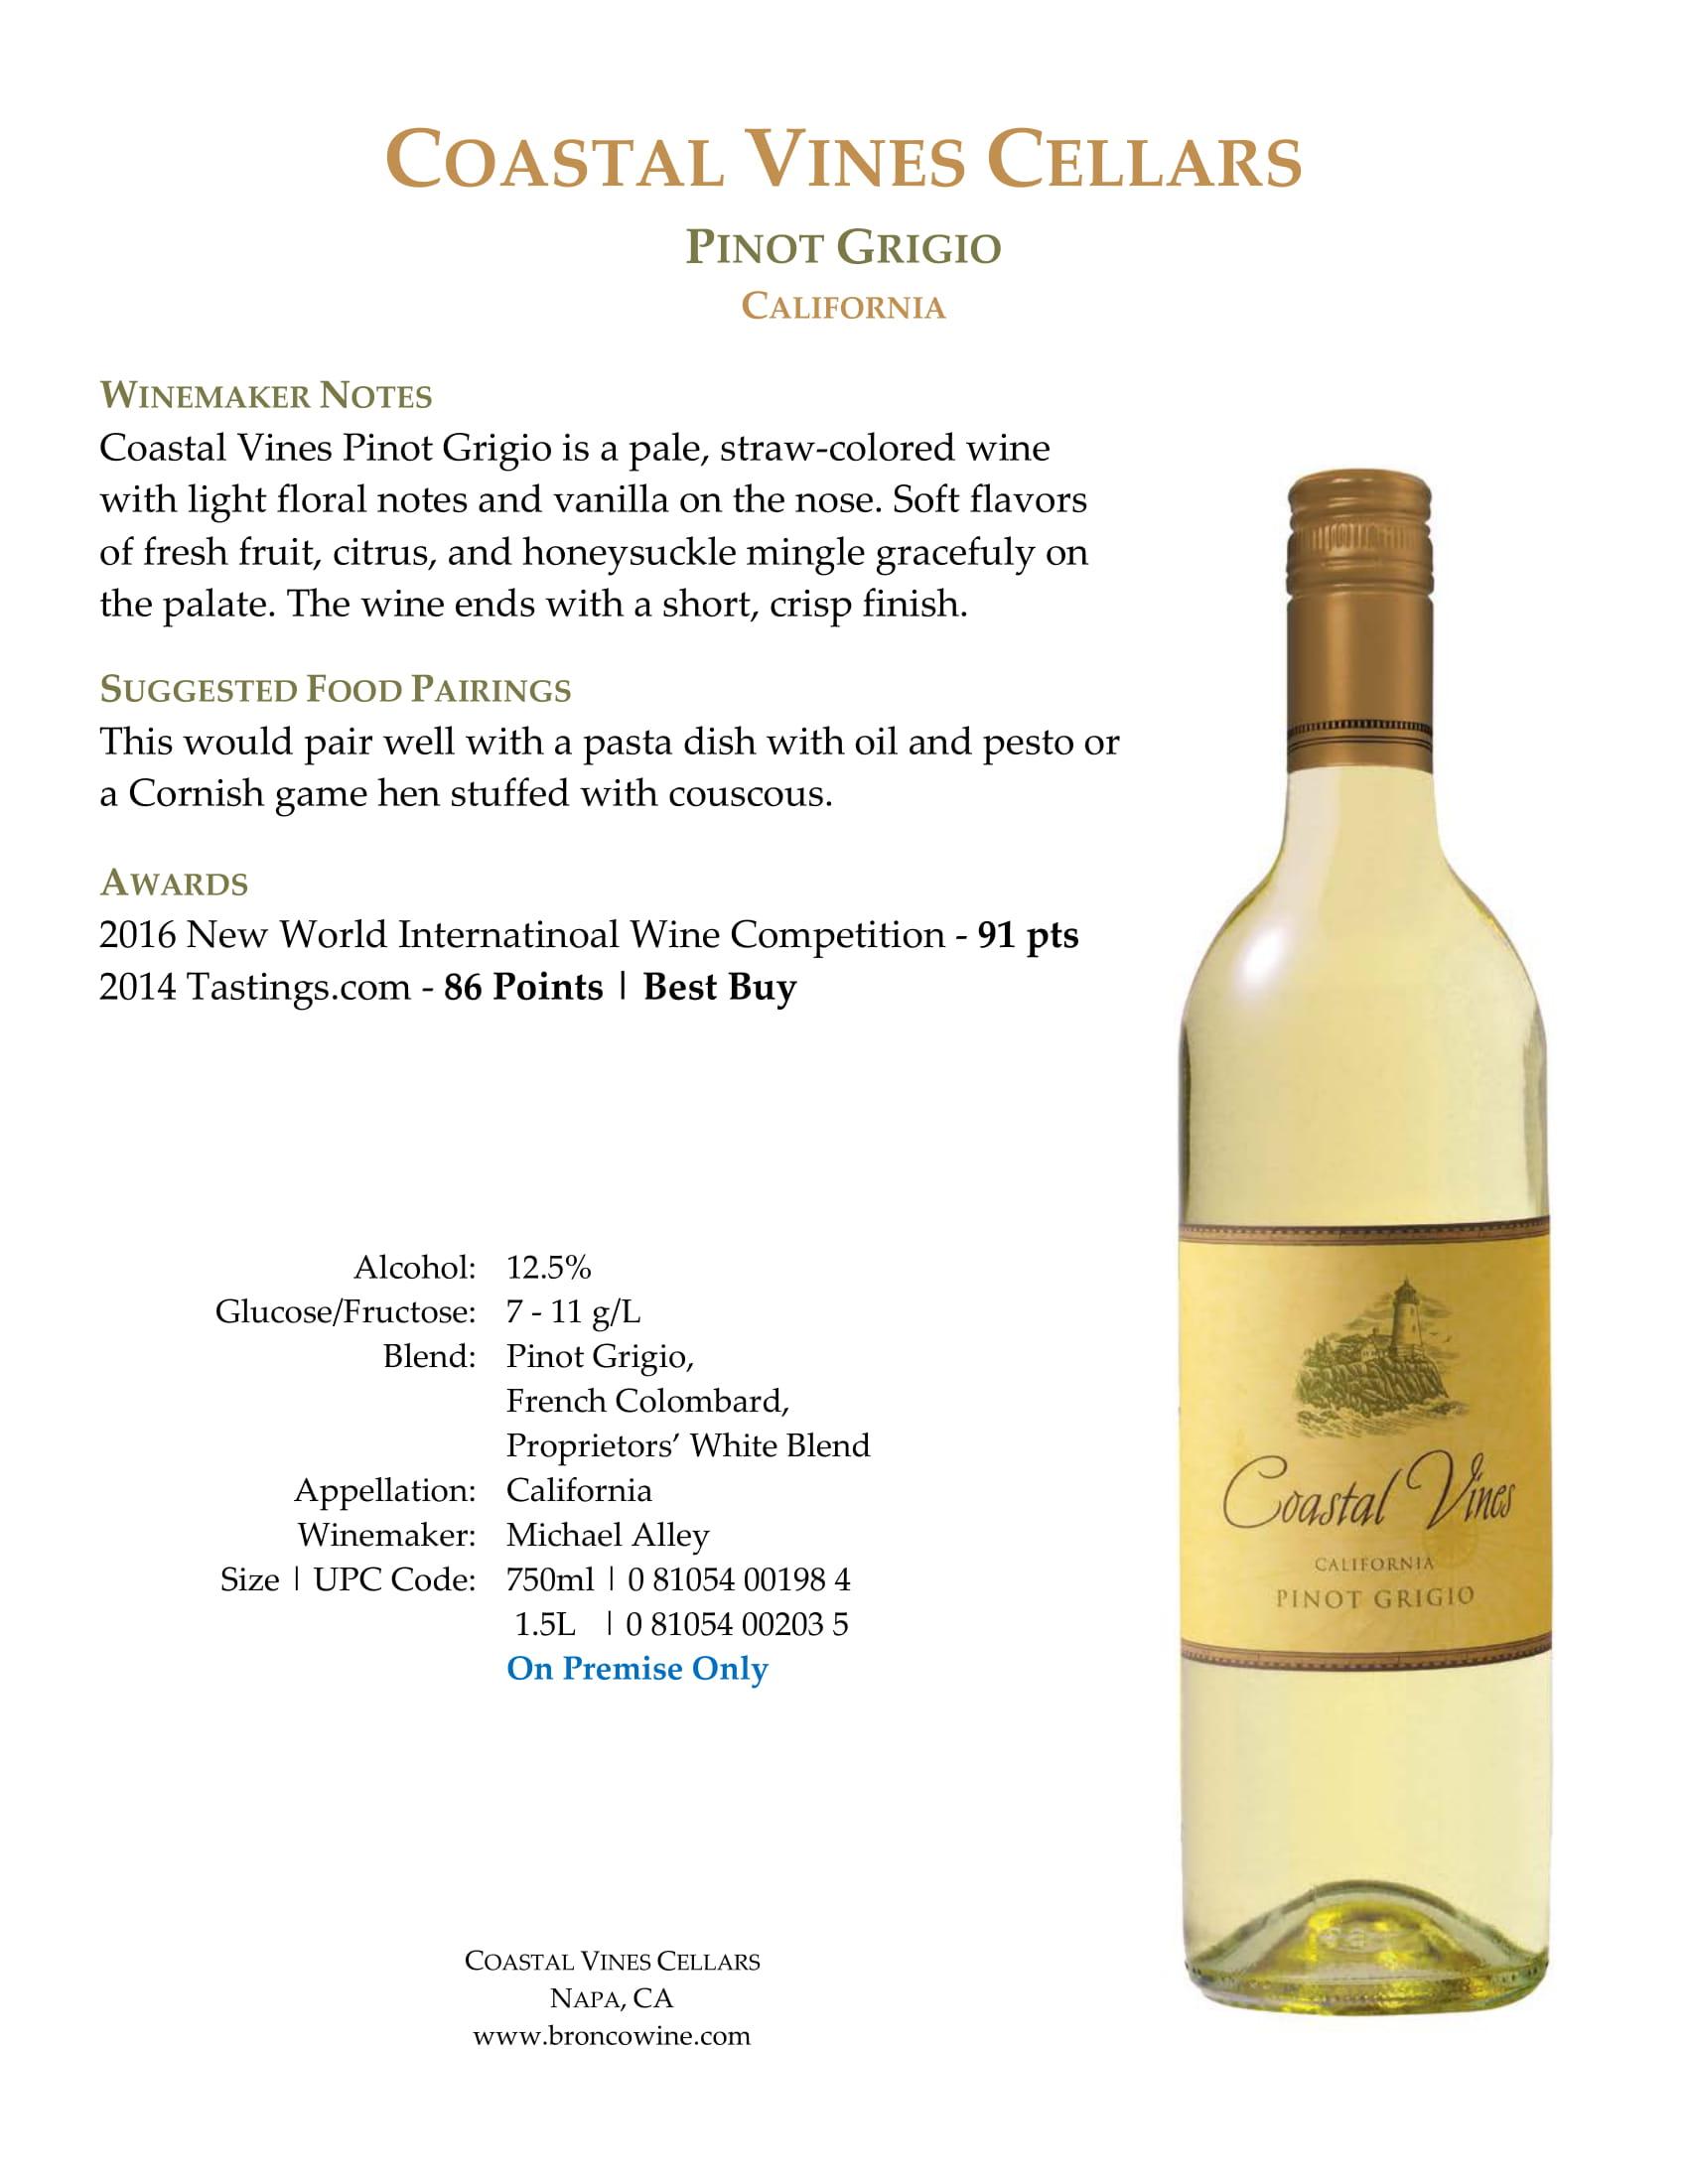 Coastal Vines Pinot Grigio Sell Sheet